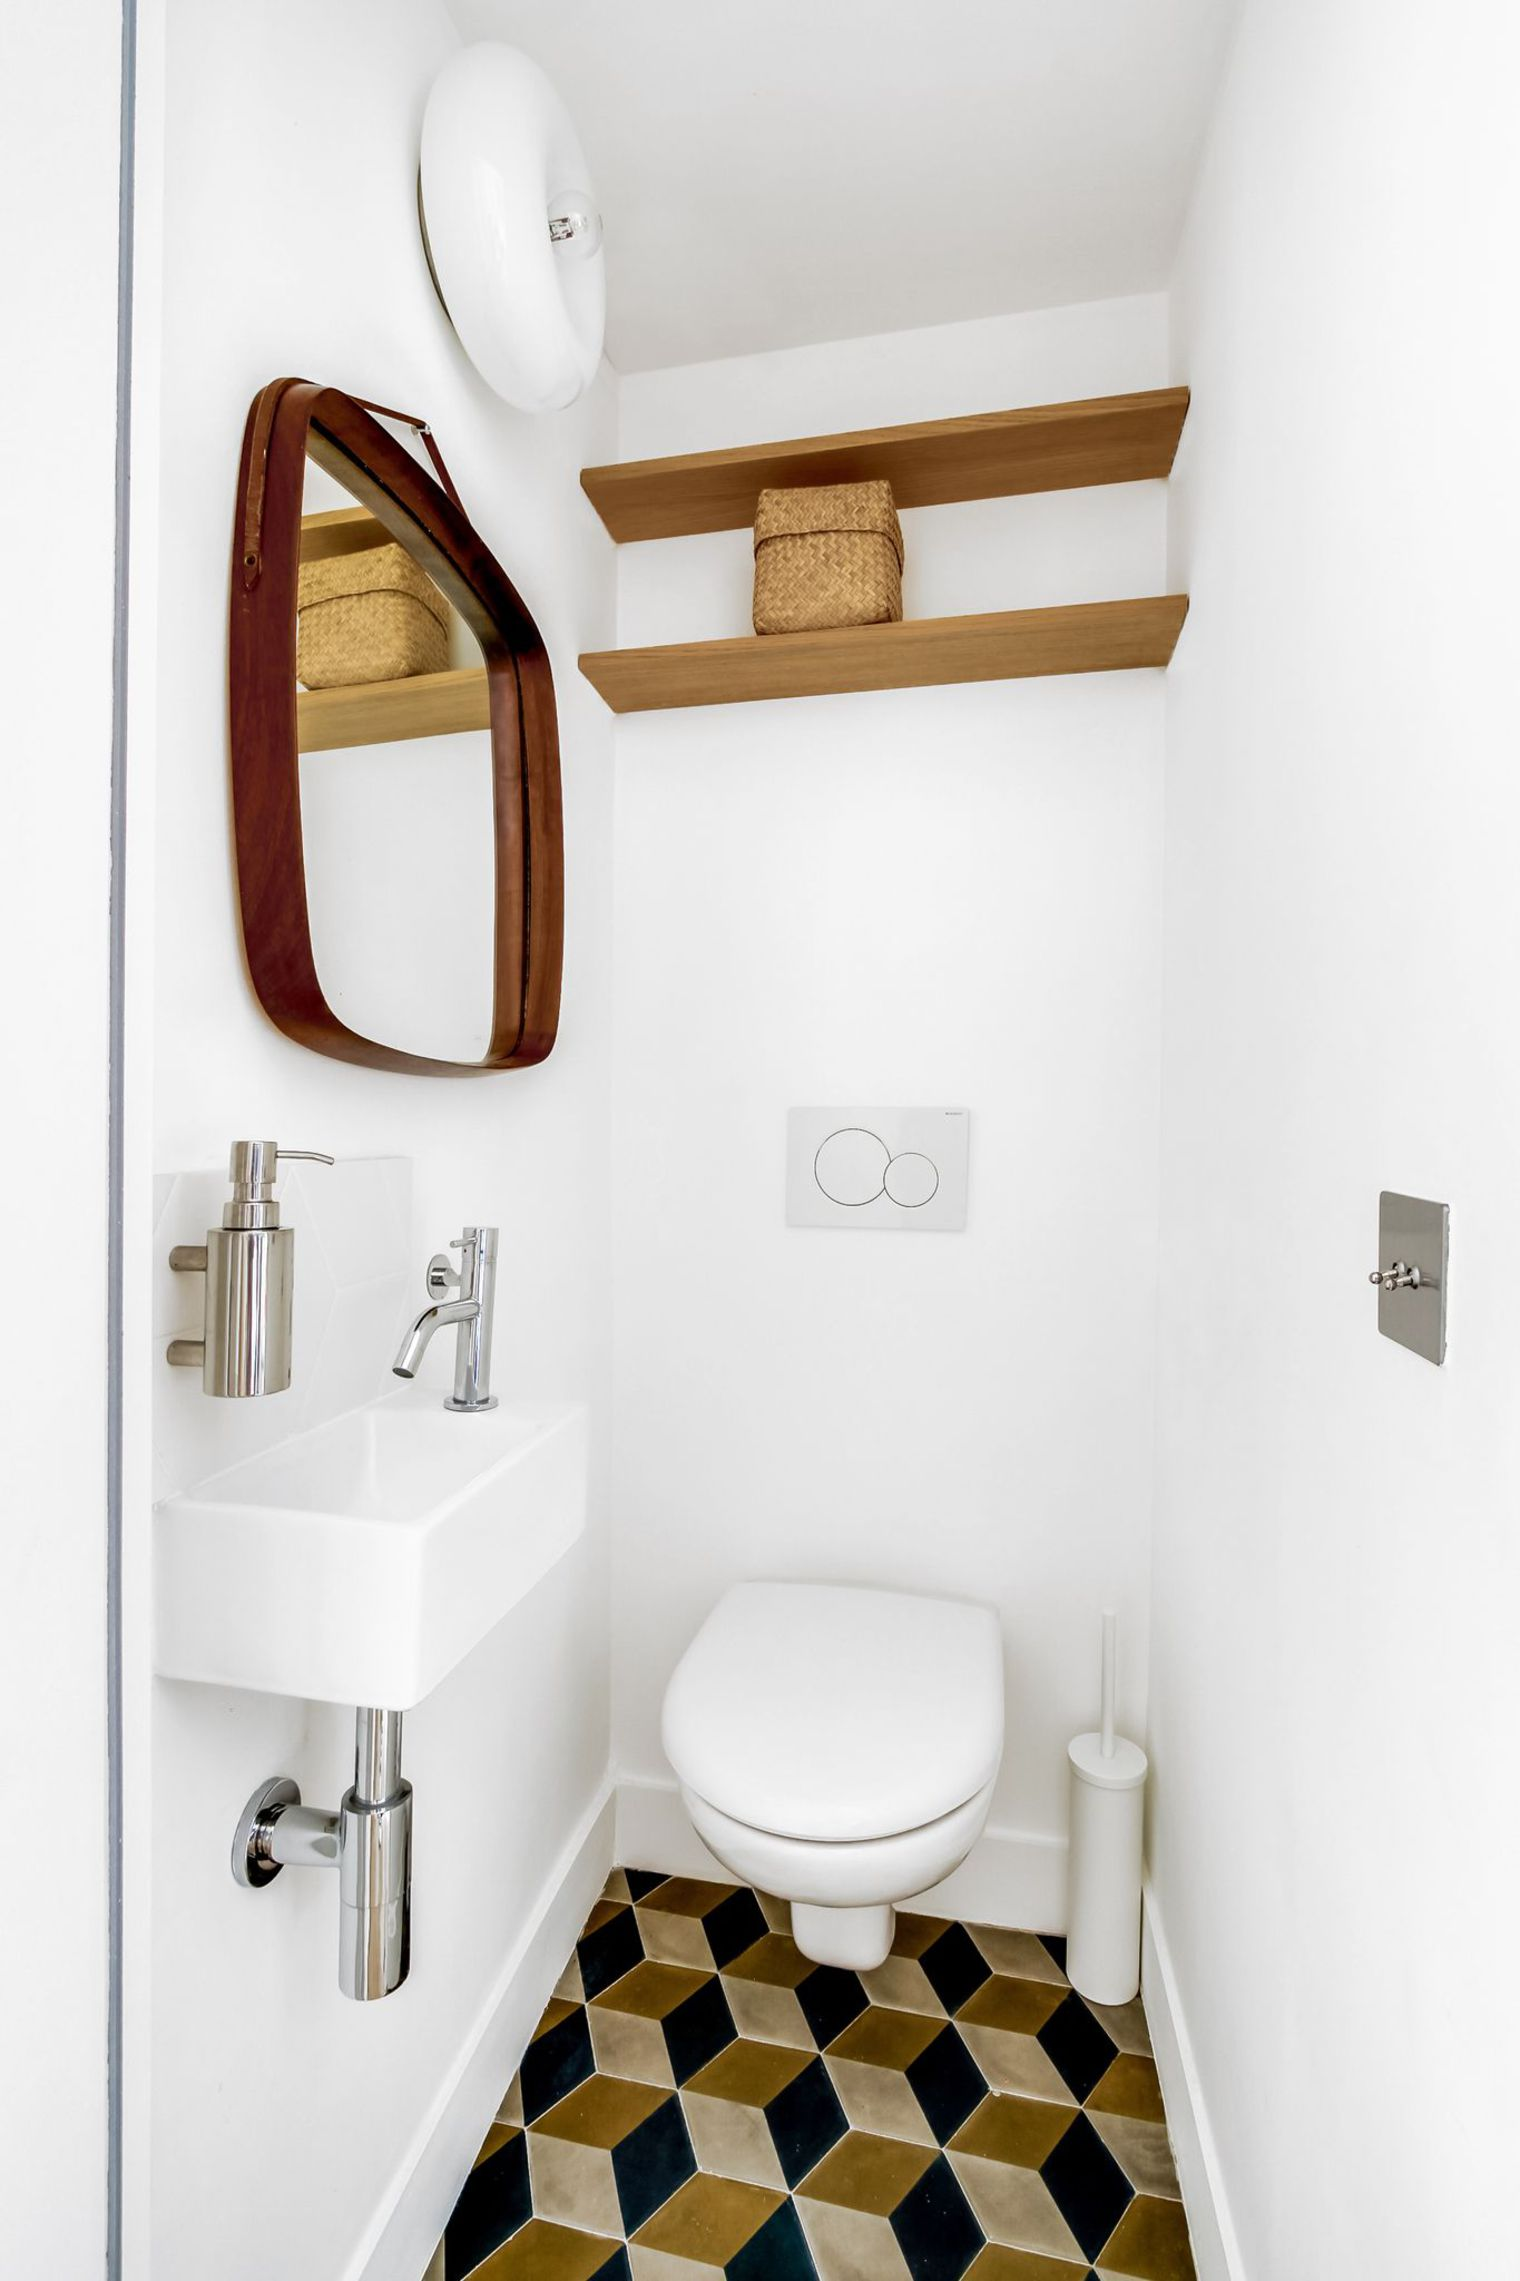 Retro vintage toilet interieur inrichting - Toilette retro ...